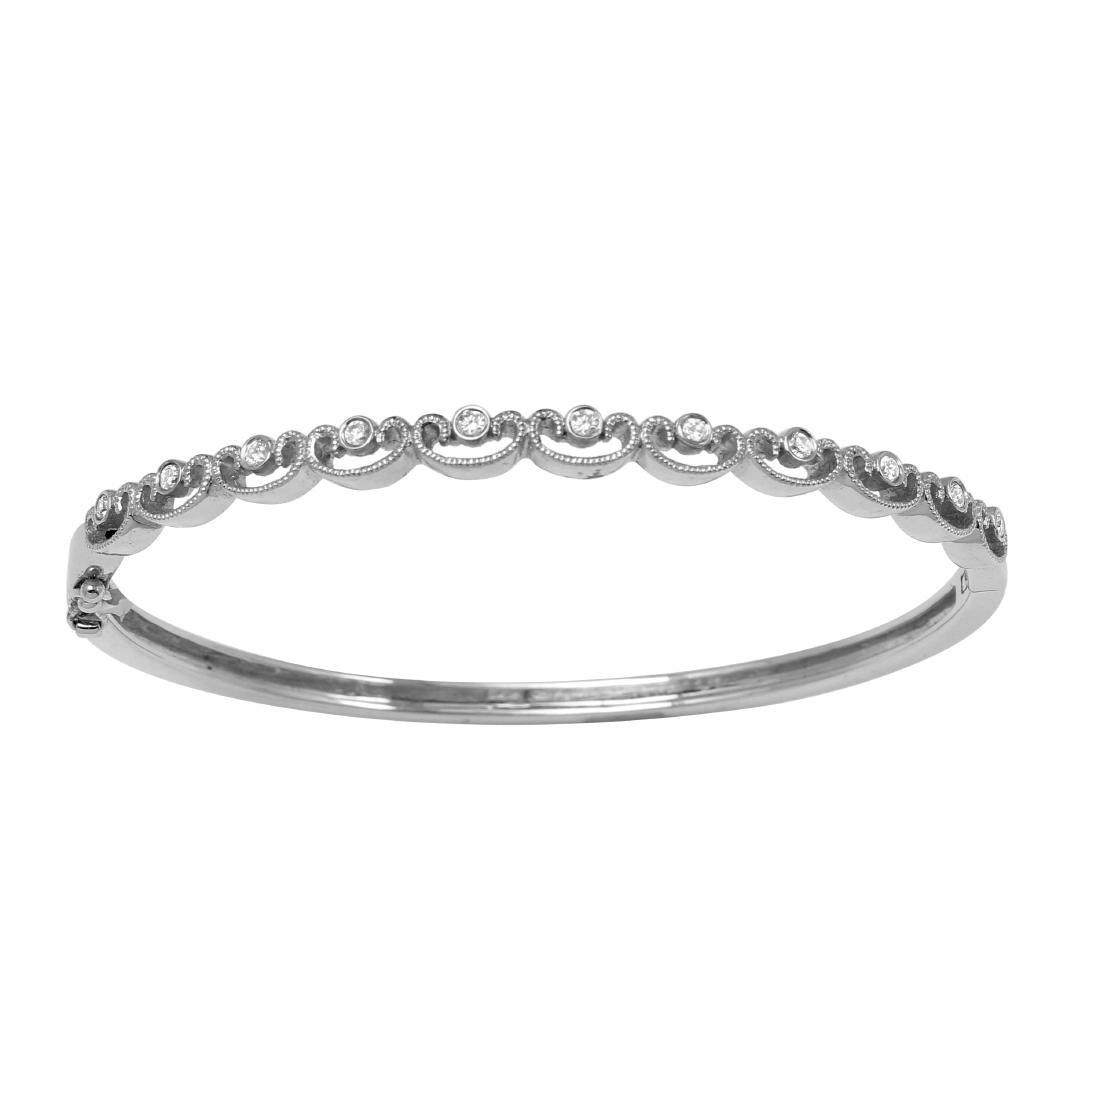 18KT White Gold Diamond Bangle Bracelet